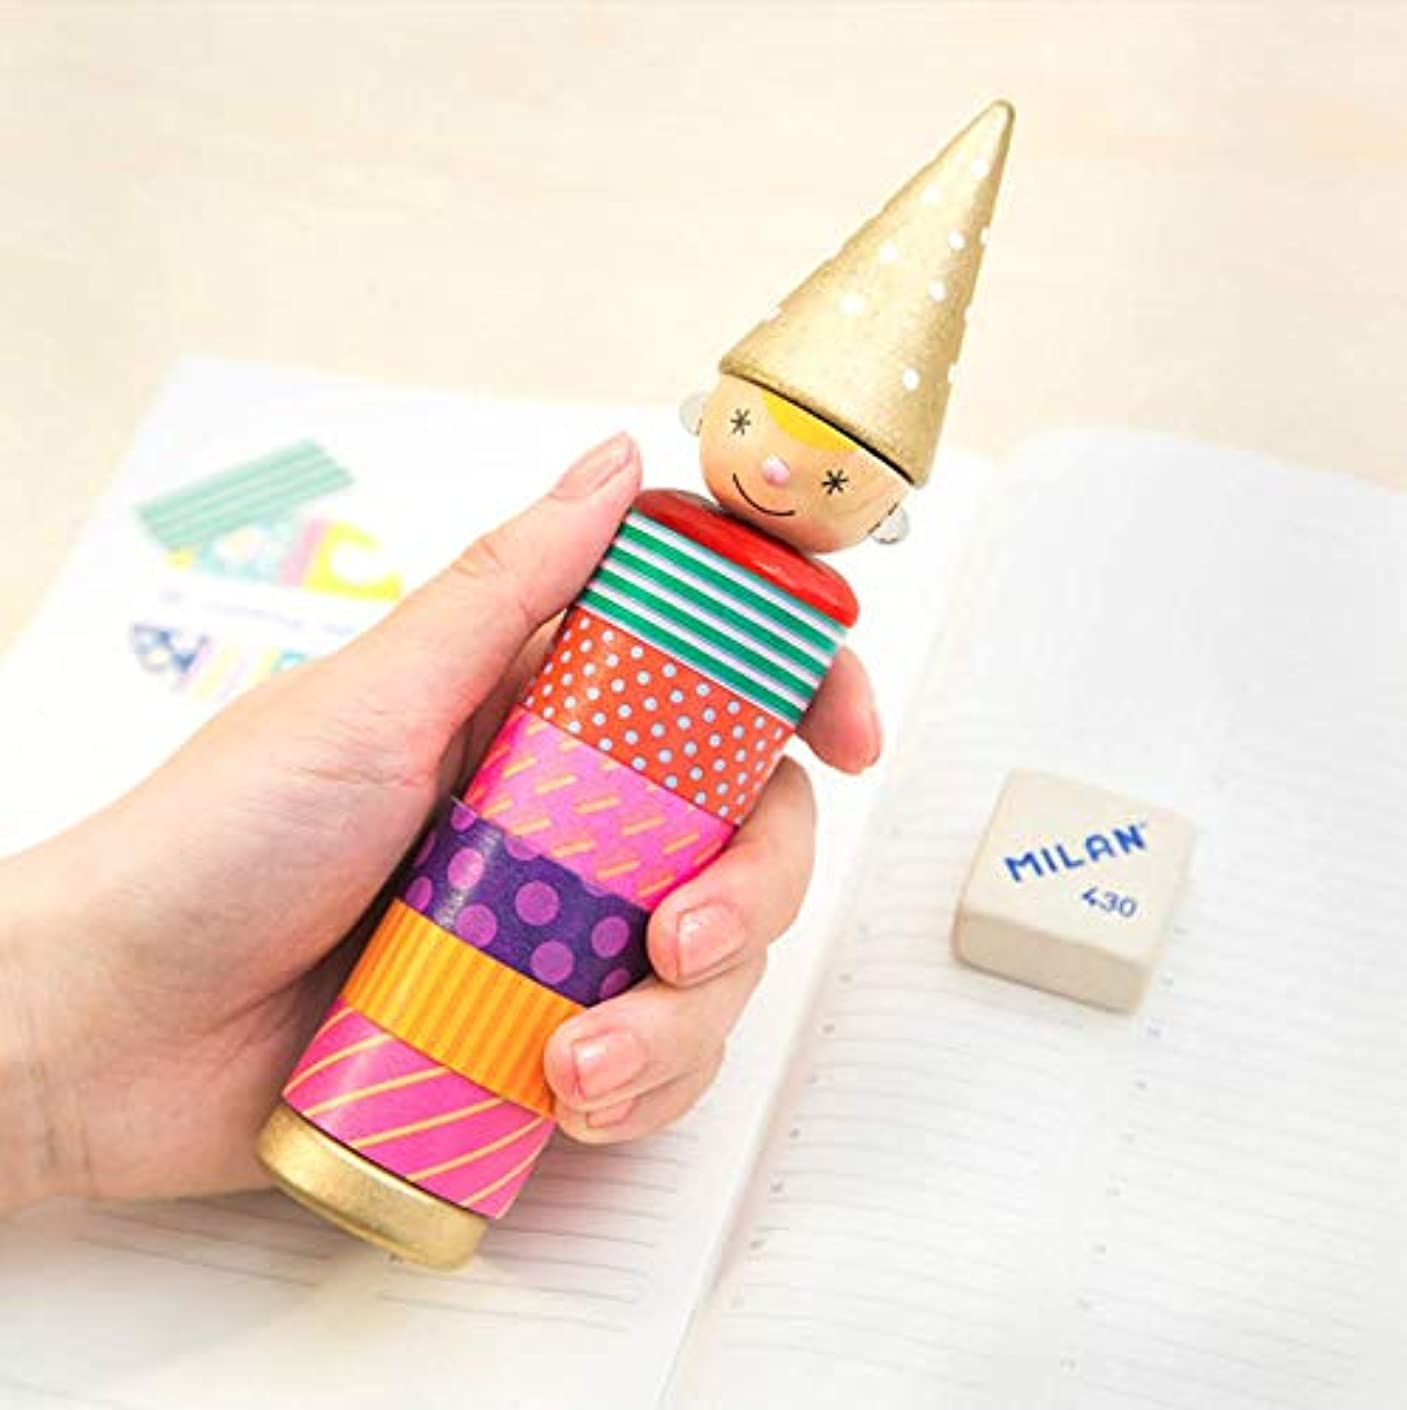 Cylindrical Washi Tape Organzier Plastic Portable Tape Dispenser Office Holder for Arts, DIY Crafts, Bullet Journal Supplies, Scrapbooking -Transparent- (Hatty Boy)